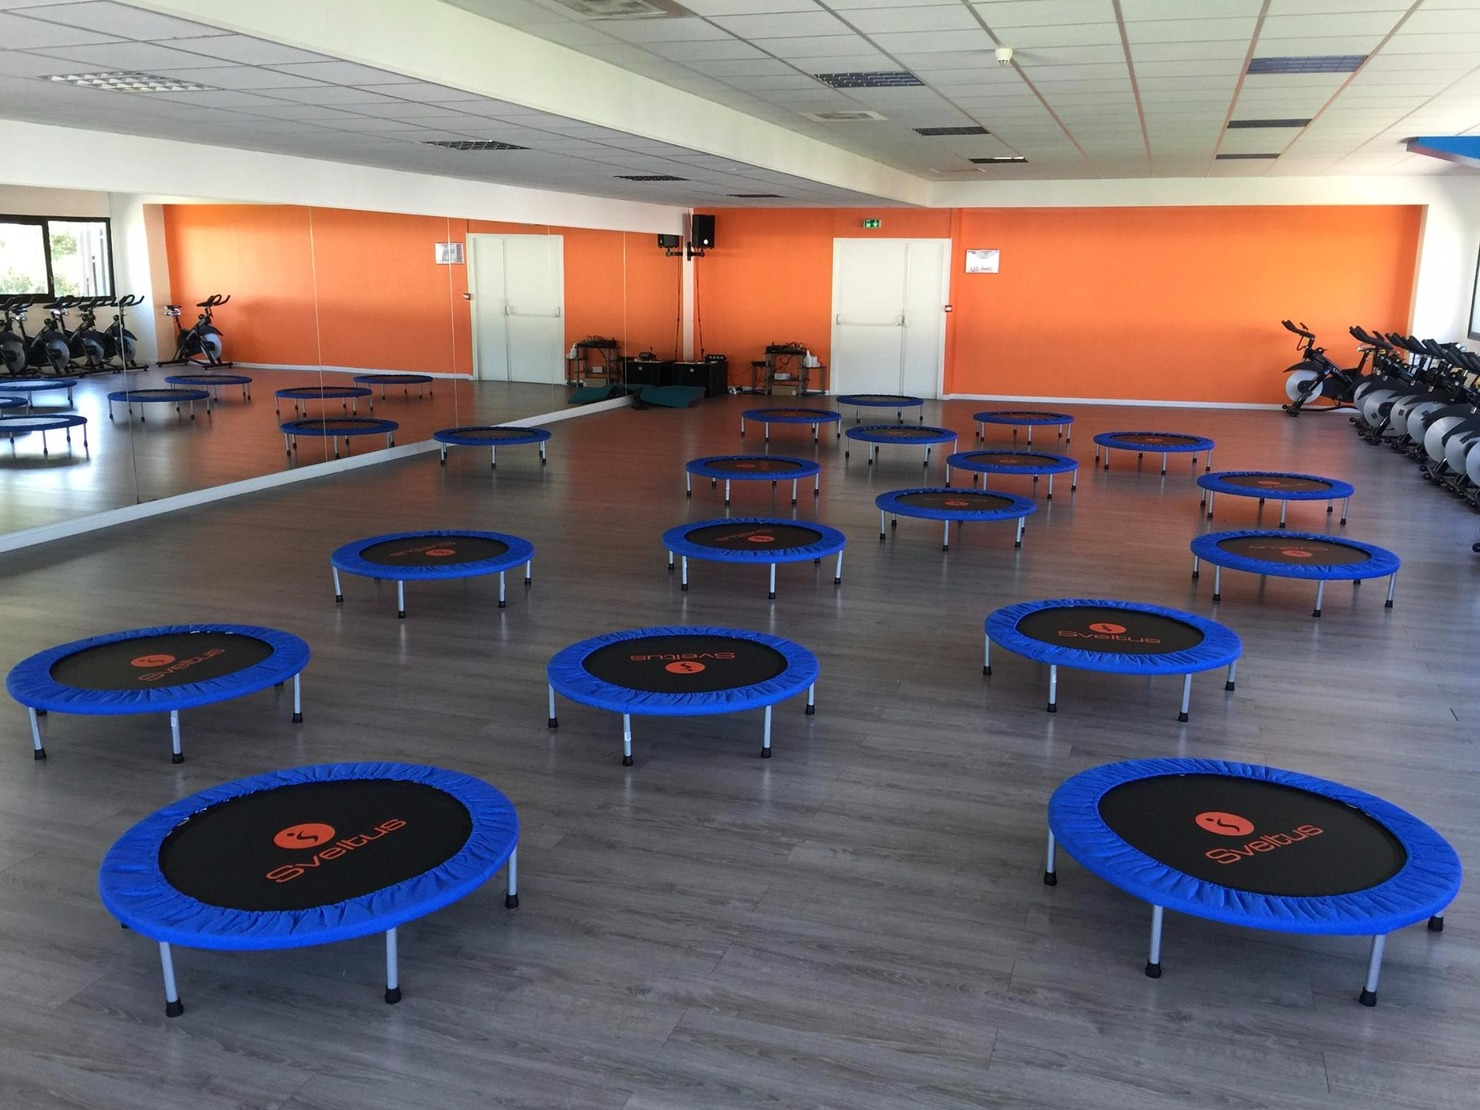 l 39 orange bleue epagny pagny tarifs avis horaires essai gratuit. Black Bedroom Furniture Sets. Home Design Ideas